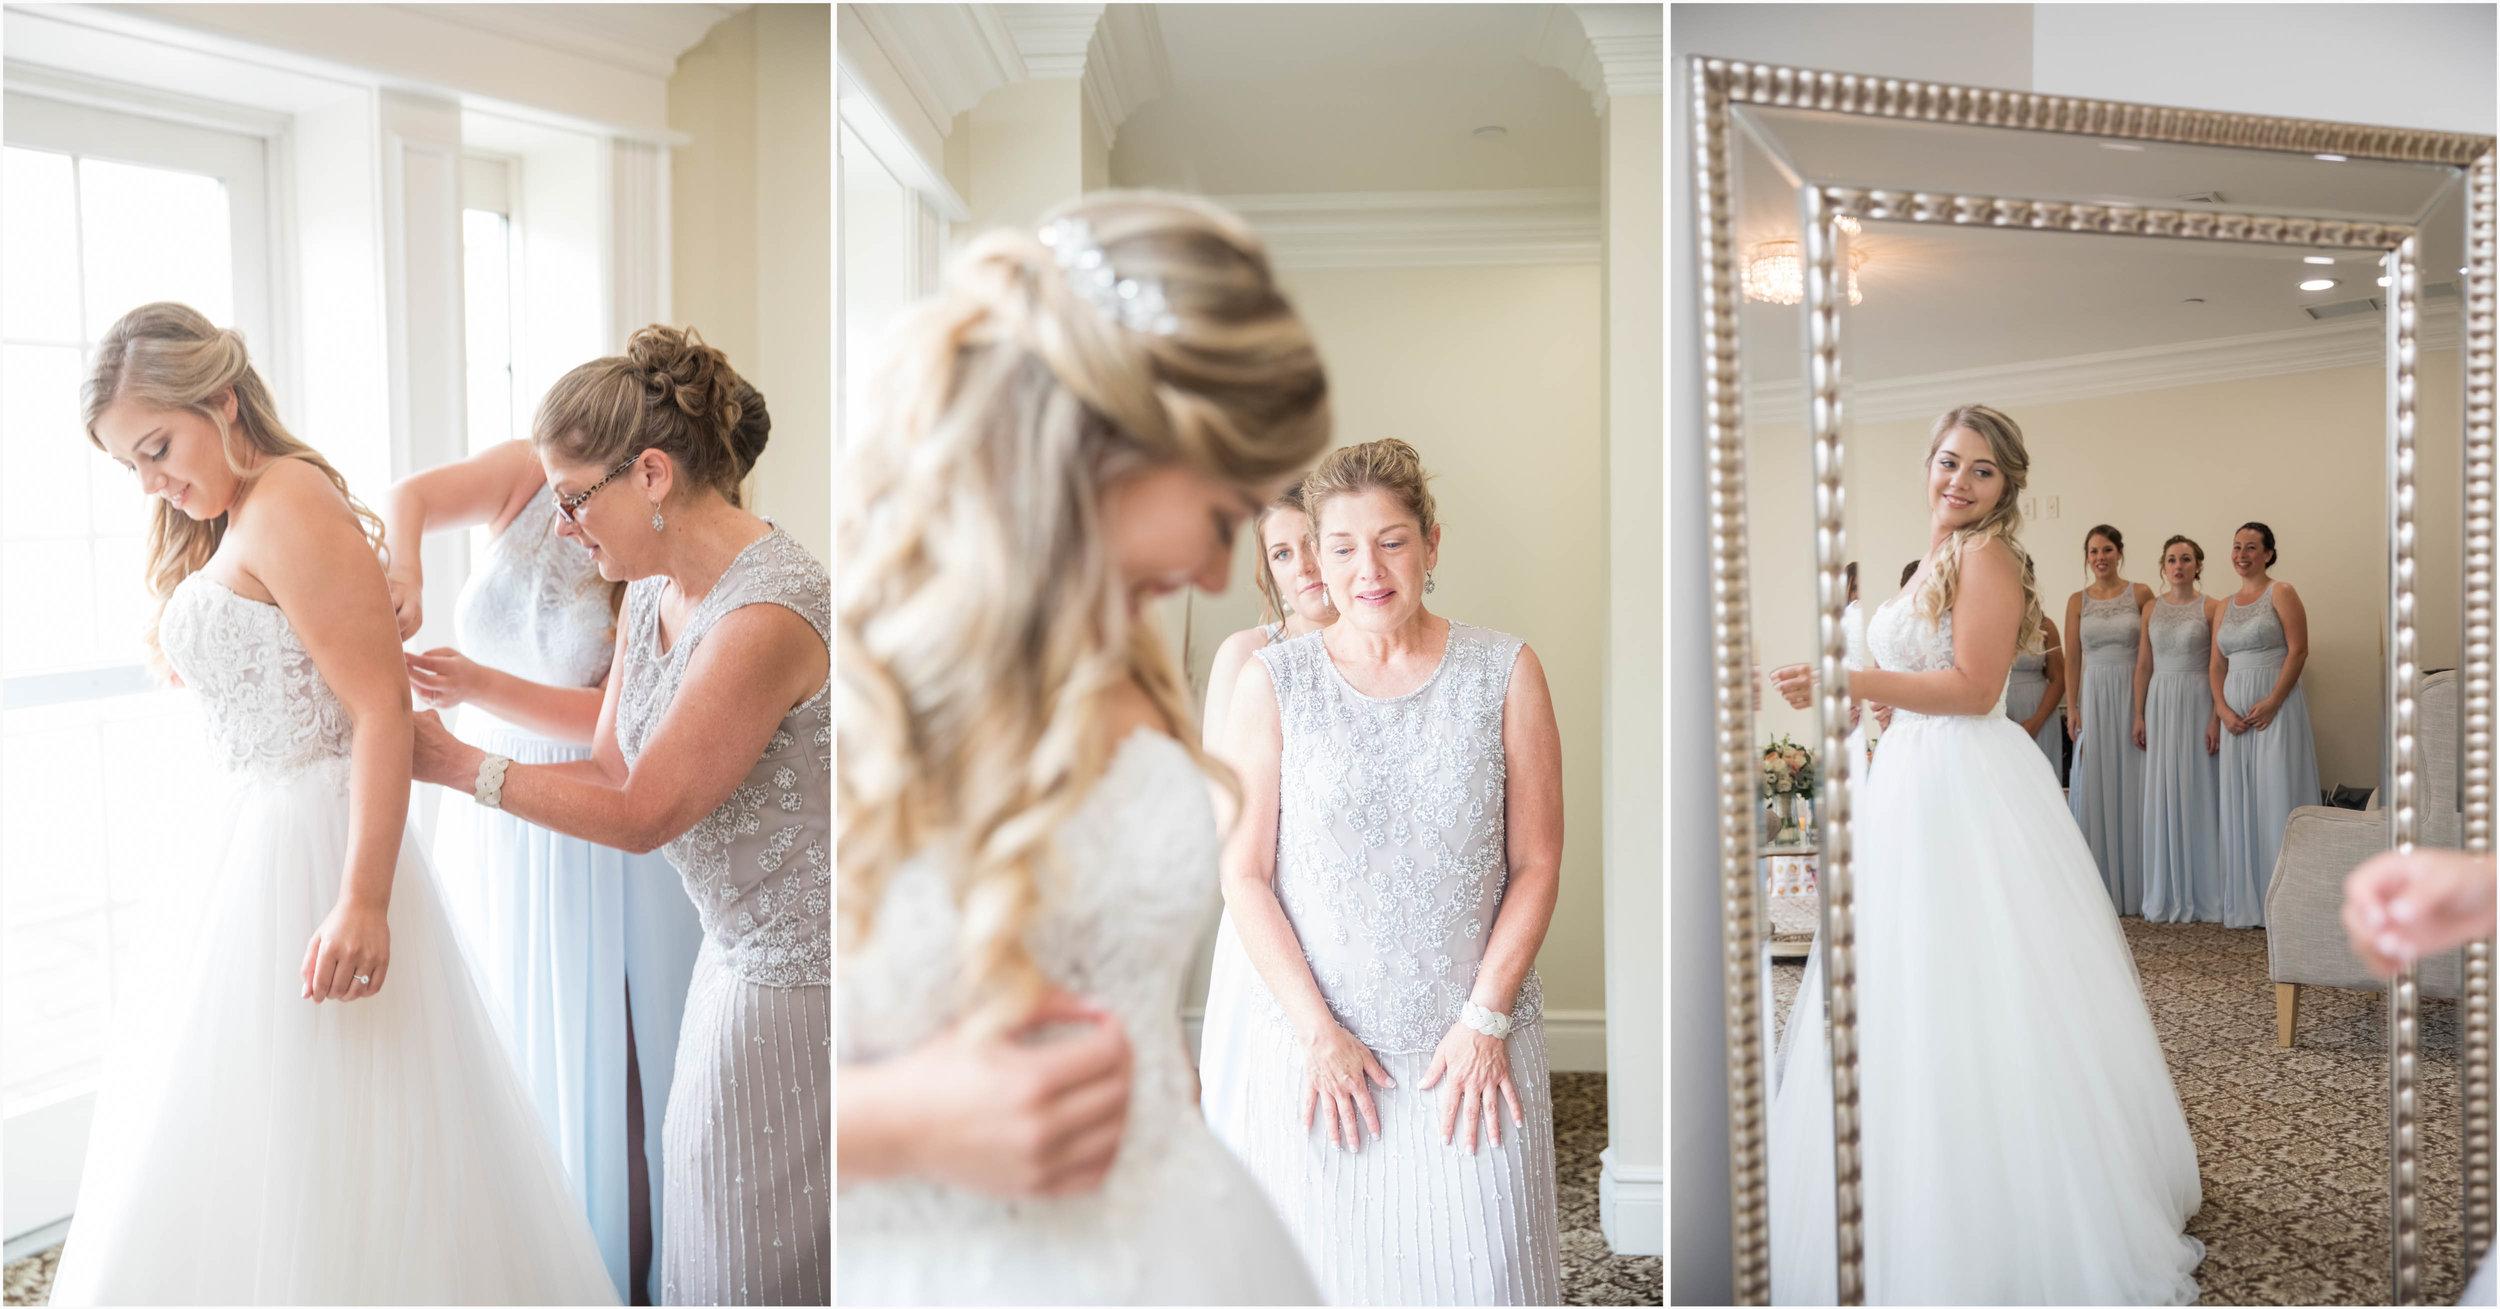 Cassondre Mae Photography Hudson Valley NY Wedding Photographer -10.jpg